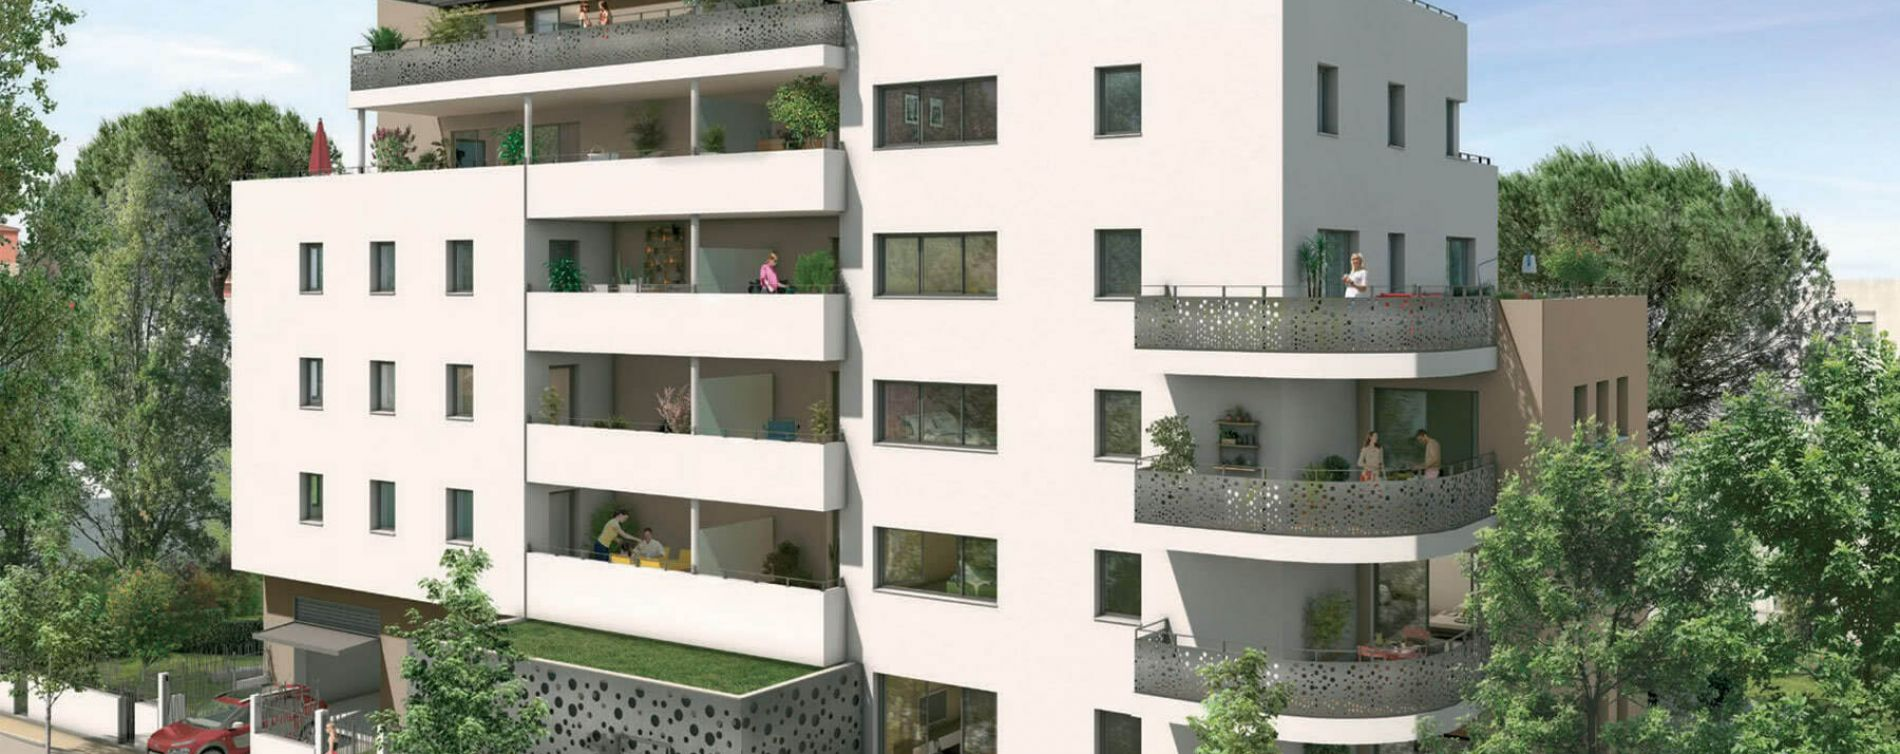 Résidence Villa Emma à Montpellier